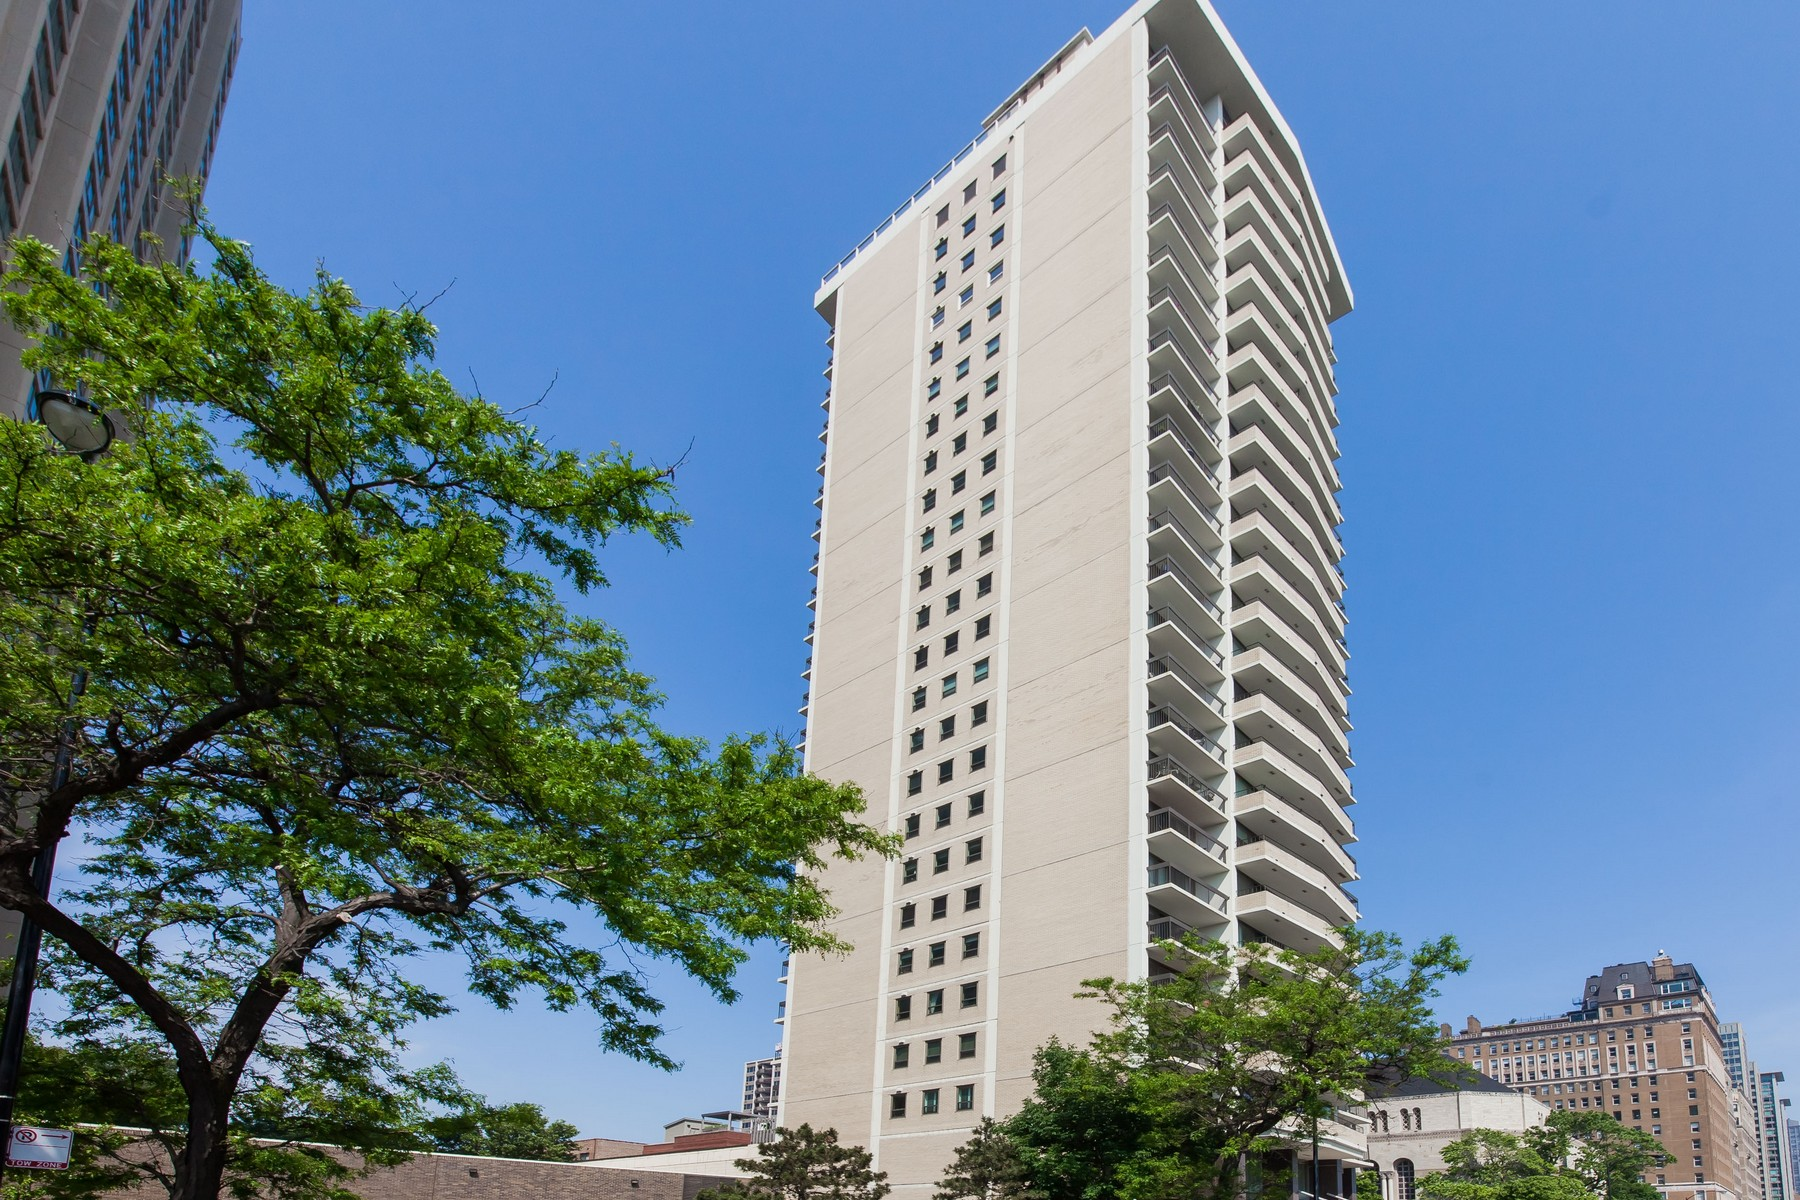 Condominium for Sale at Luxurious Lake Shore Condo 3470 N Lake Shore Drive Unit 21B Lakeview, Chicago, Illinois, 60657 United States